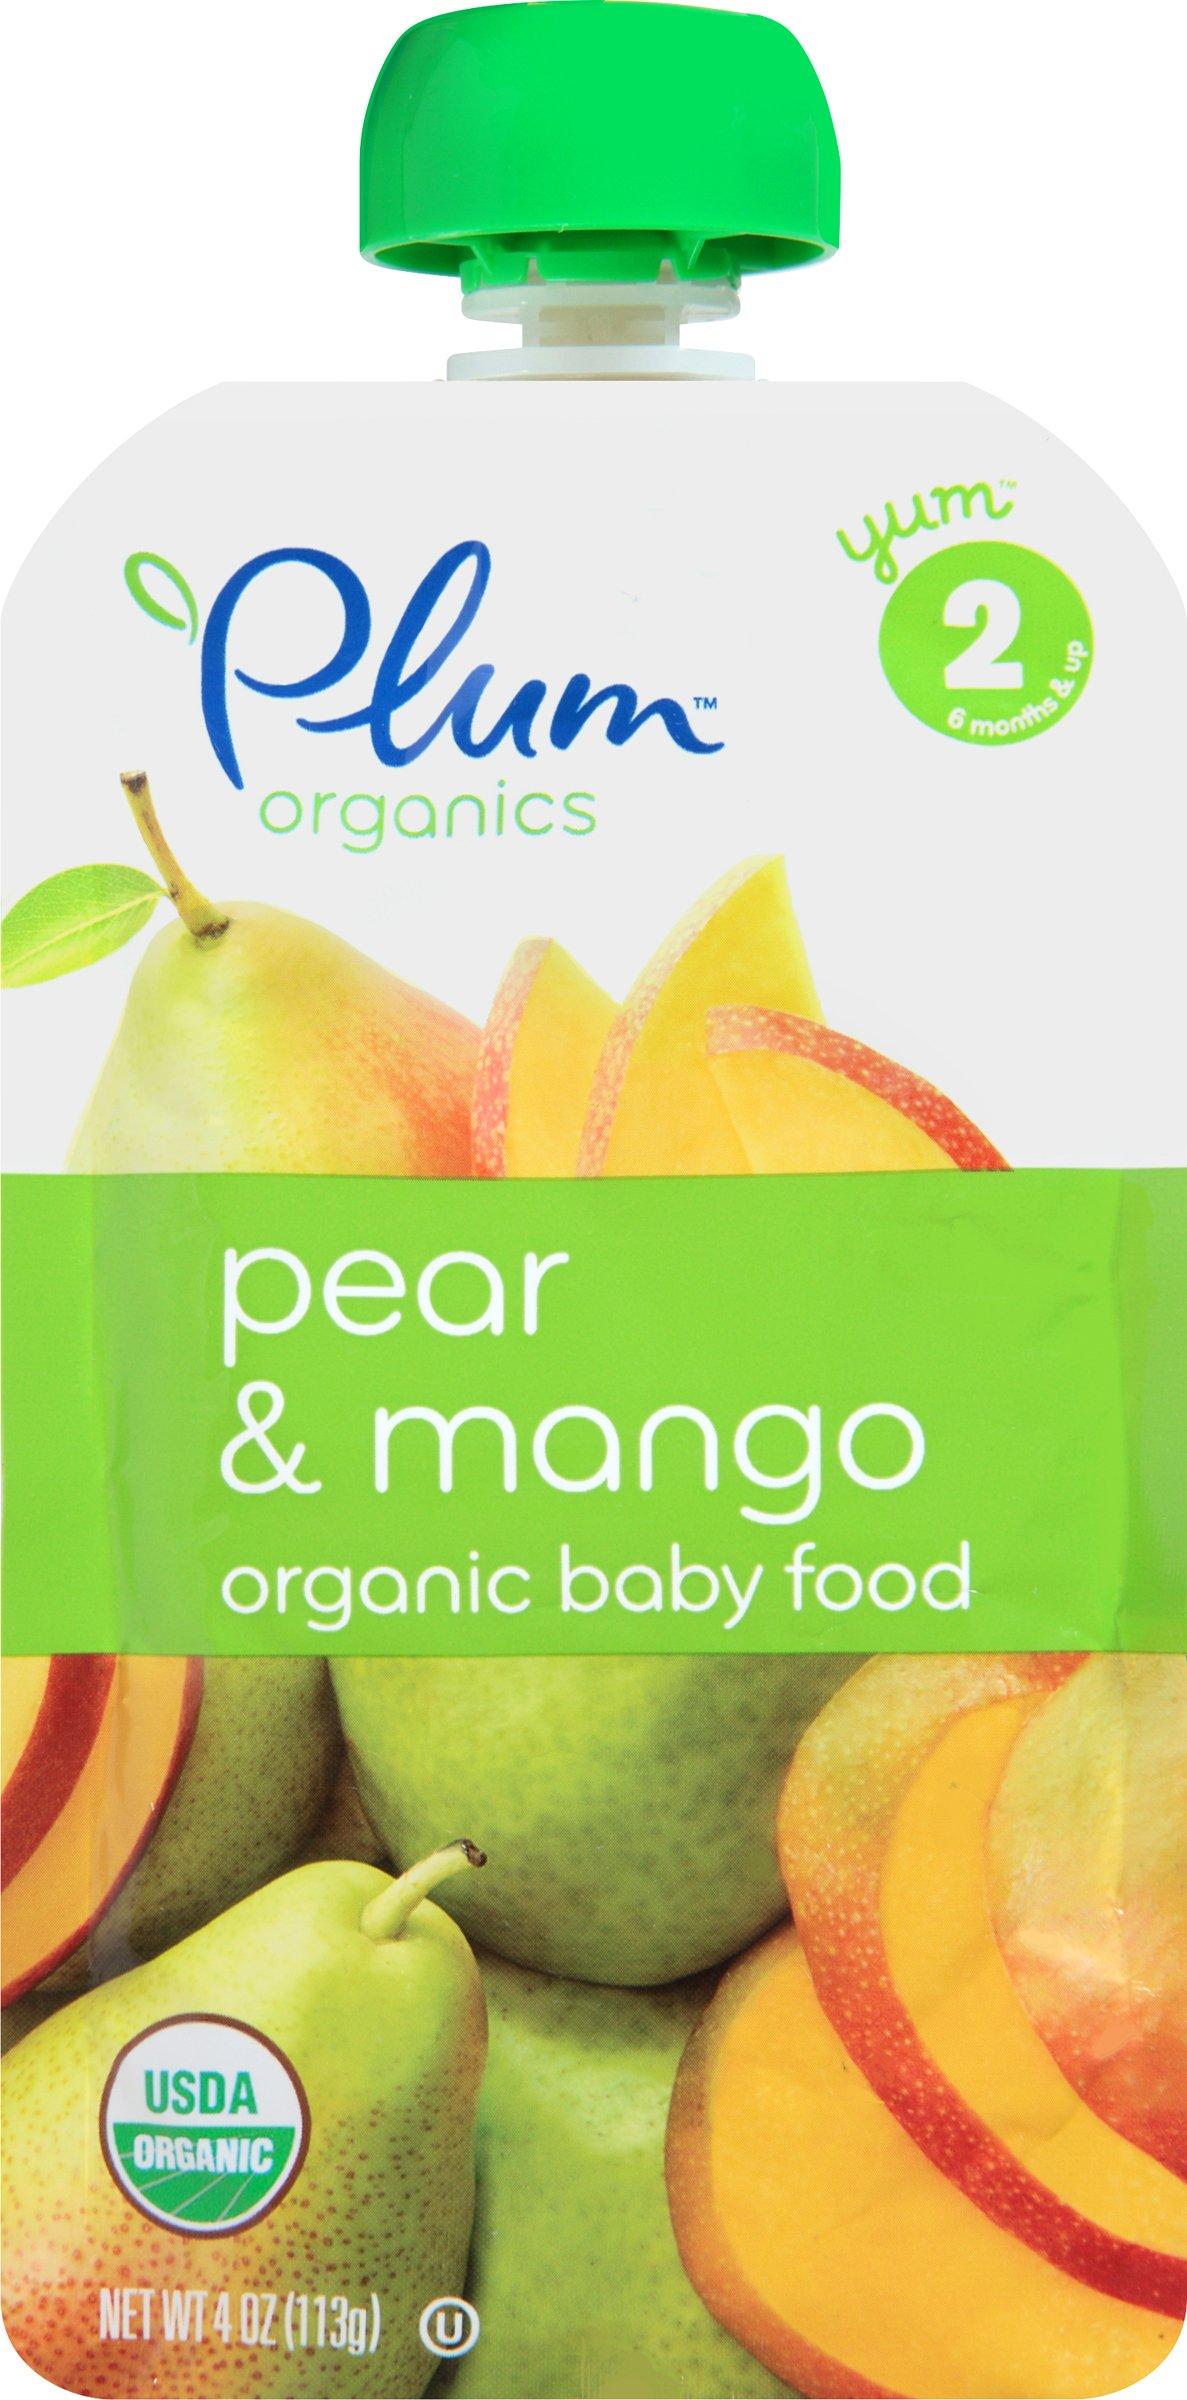 Plum Organics Stage 2, Organic Baby Food, Pear, and Mango, 4 Ounce